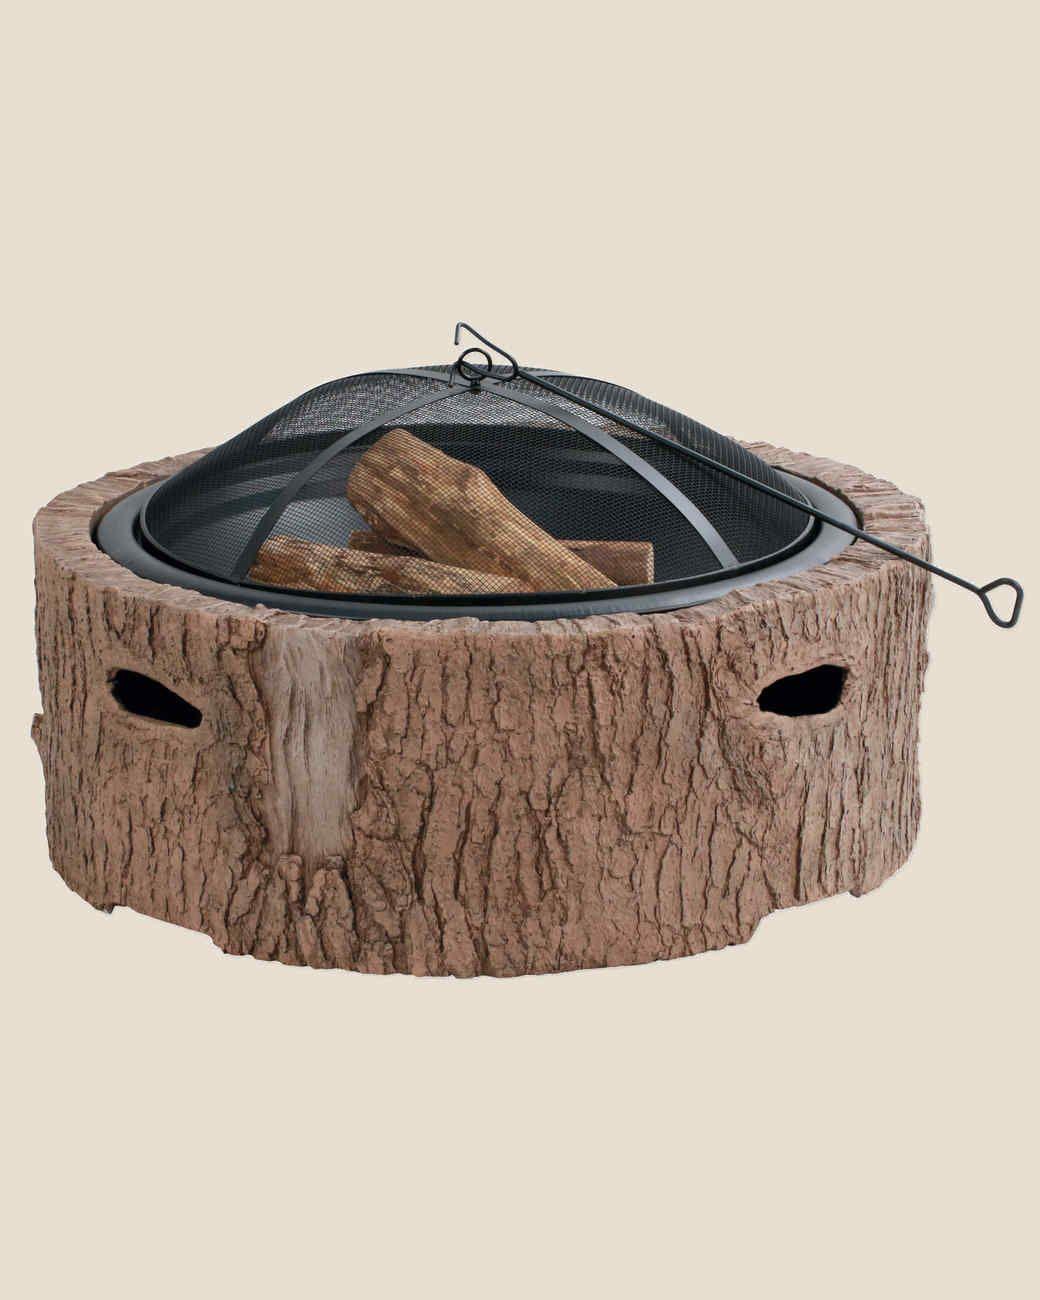 how to make a burn barrel last longer